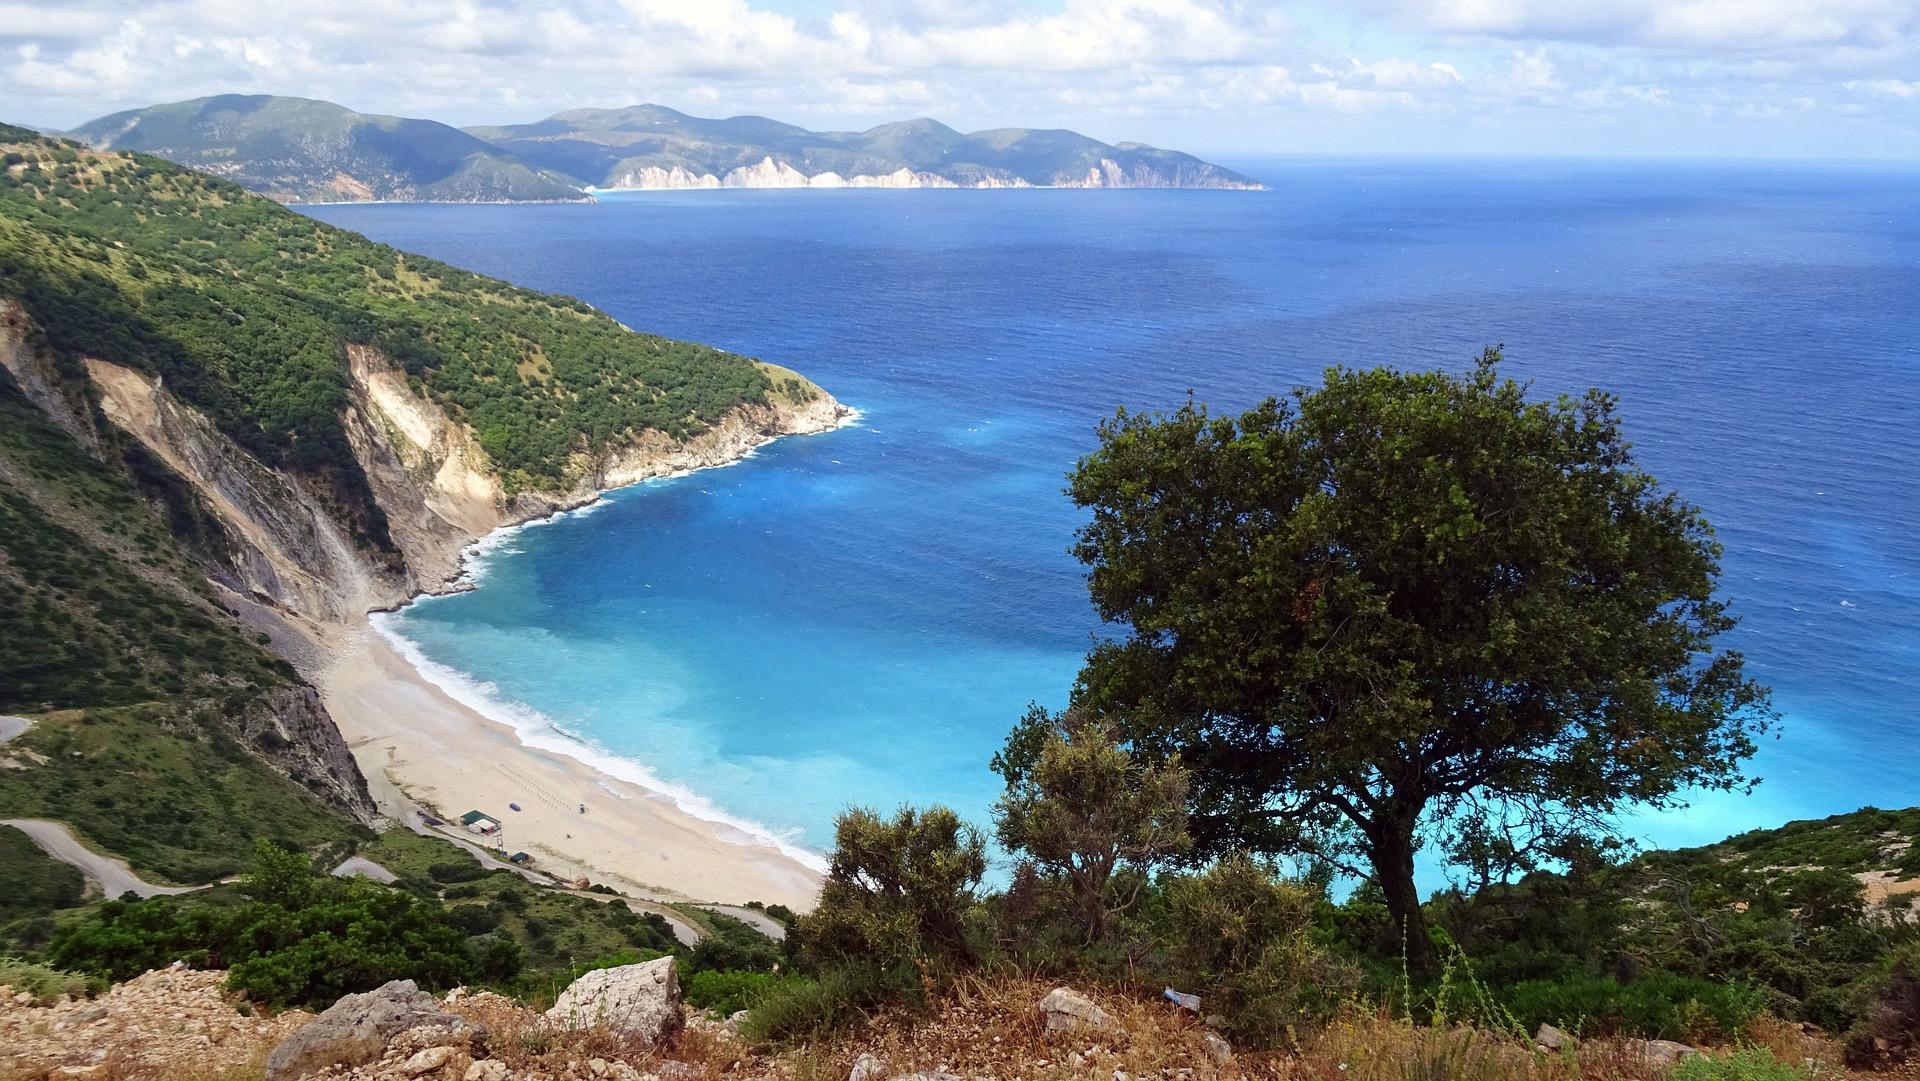 Kefalonia Urlaub eine Woche ab 159,59€ sogar im Juli